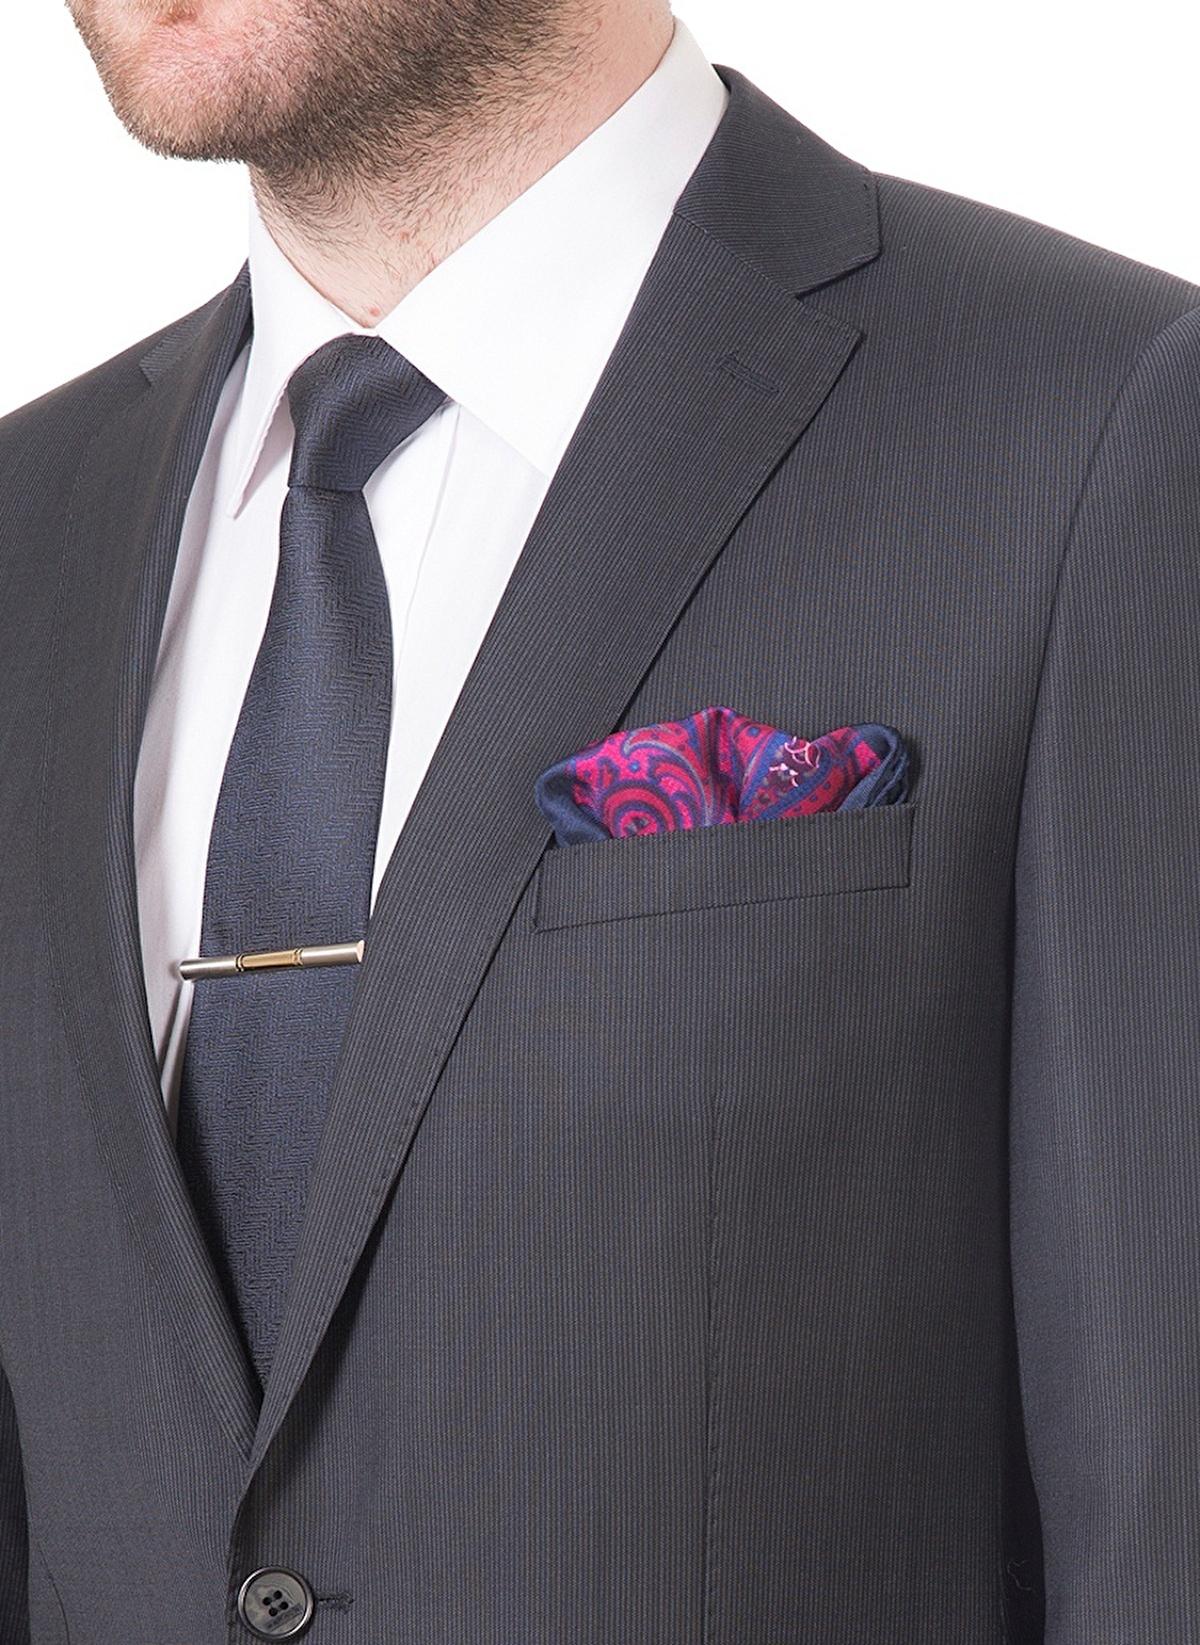 5e42b6f737ffb Karaca Erkek Takım Elbise Lacivert | Morhipo | 15473283